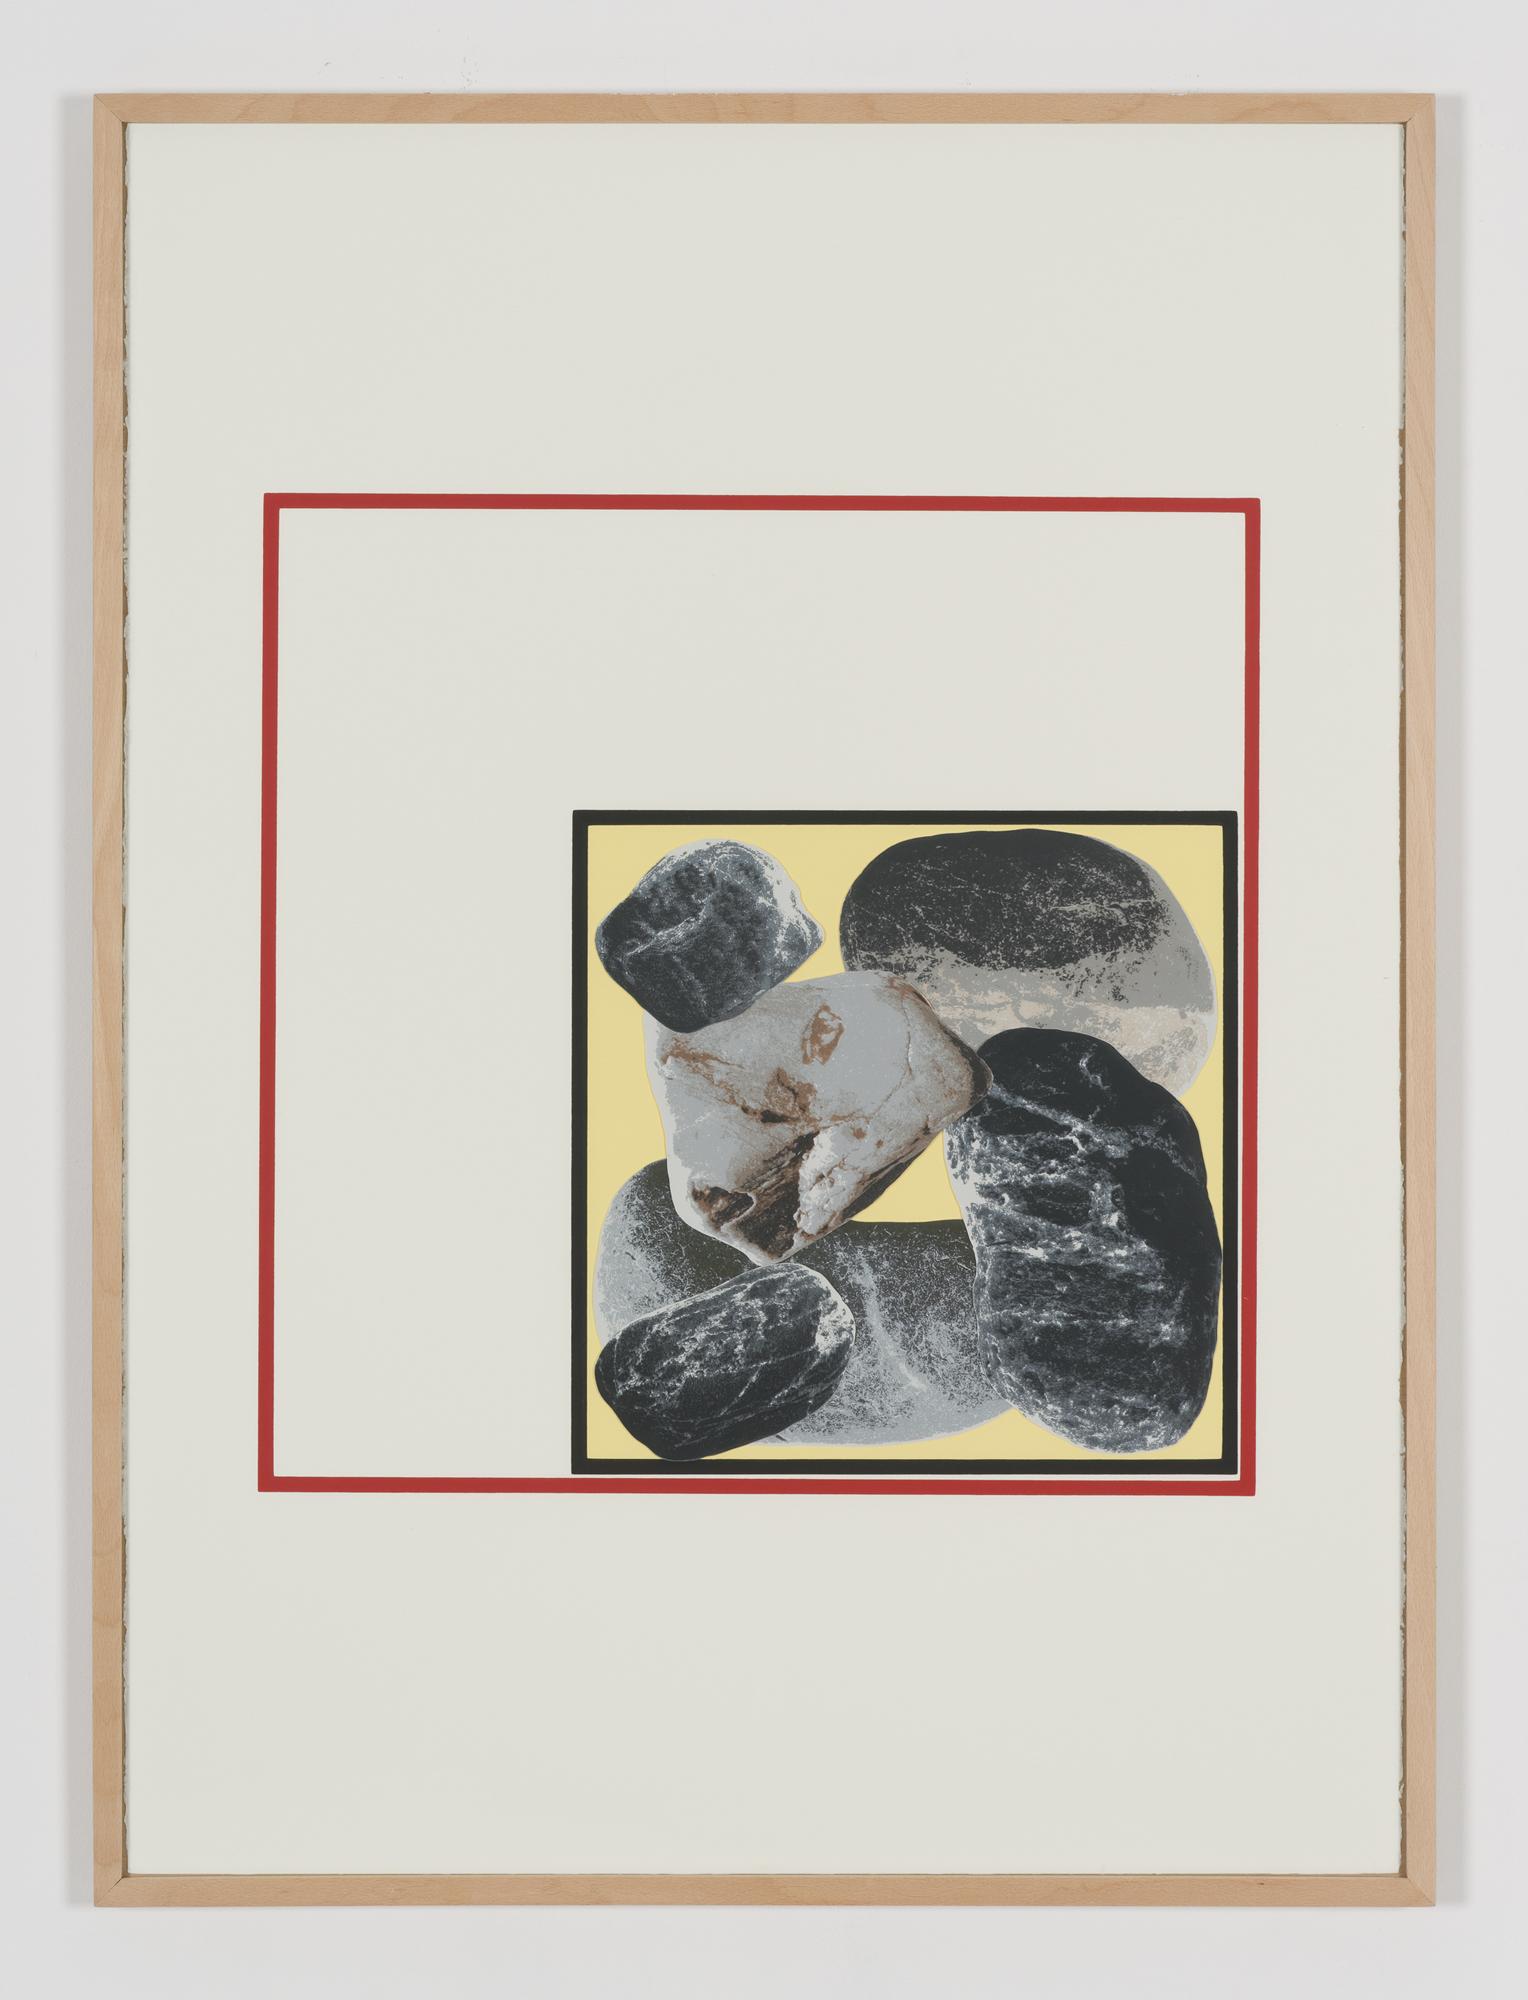 Panta Rhei, silk screen print, rearrangeable cut-out elements, wooden frame, 77 x 105 cm, from a series of twenty, 2015